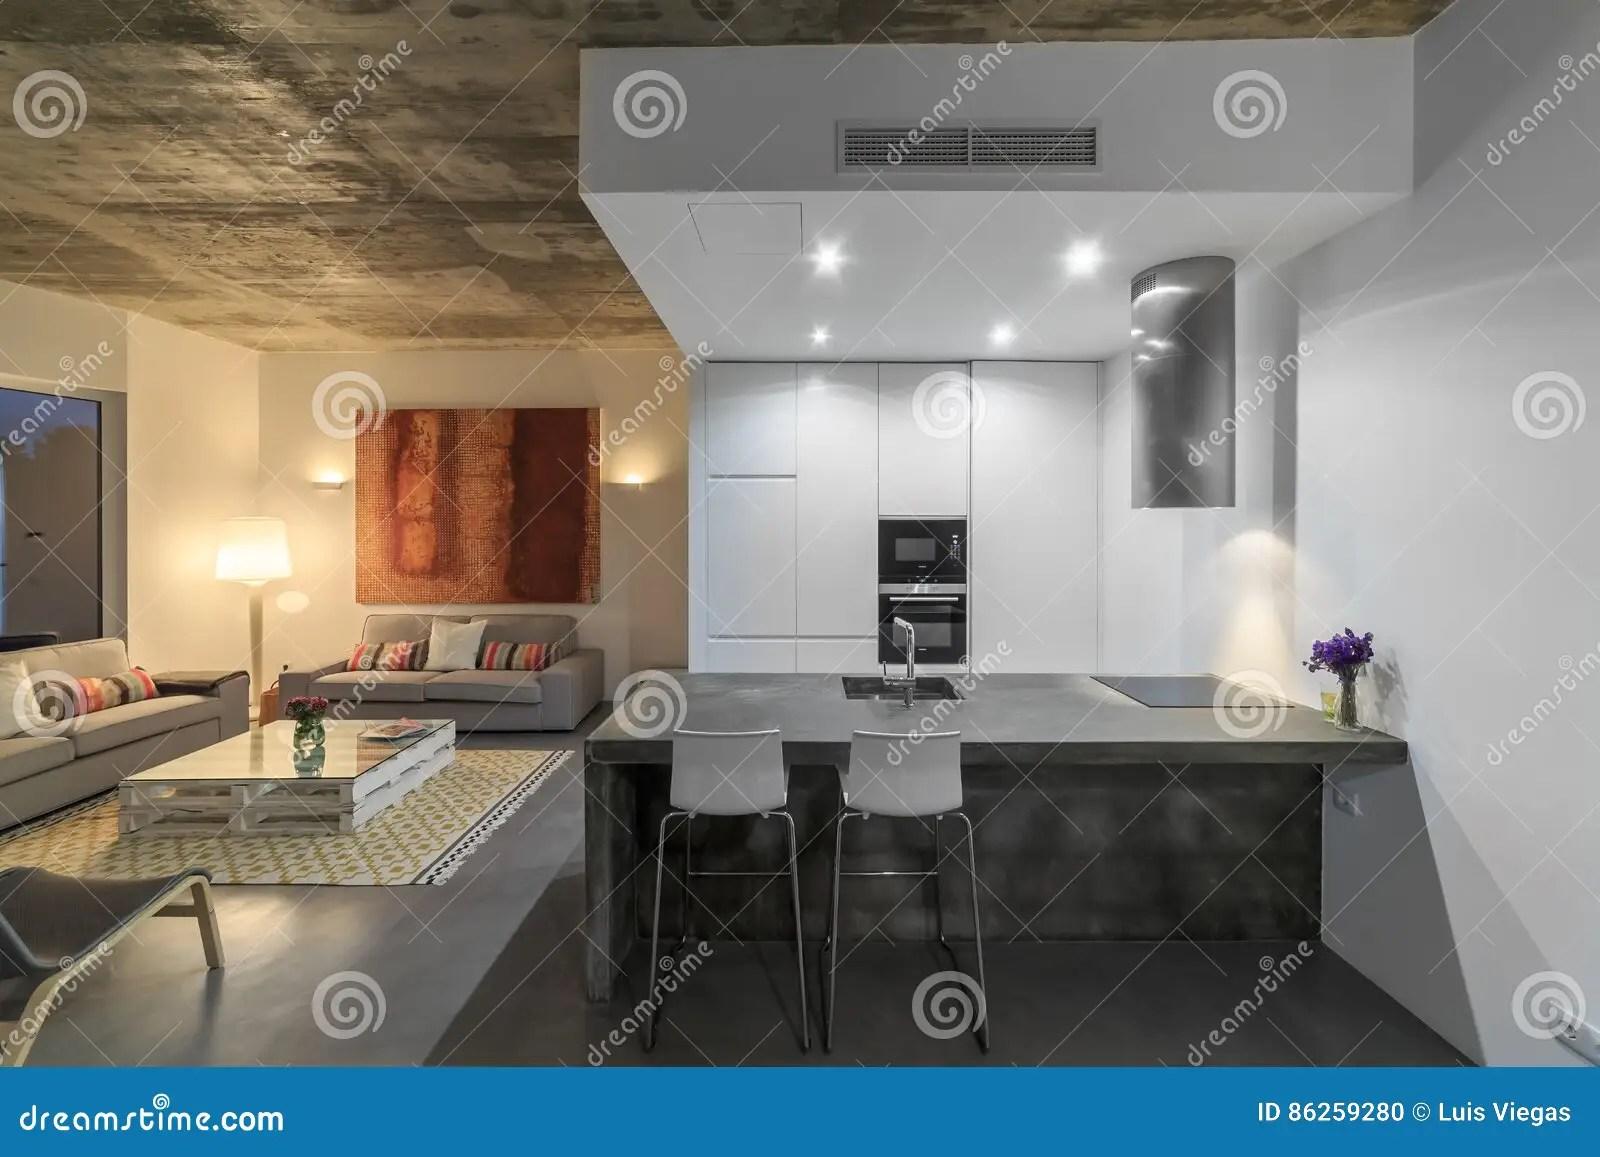 Cucina Moderna Bianca E Nera | Piastrelle Cucina Bianche Stunning ...